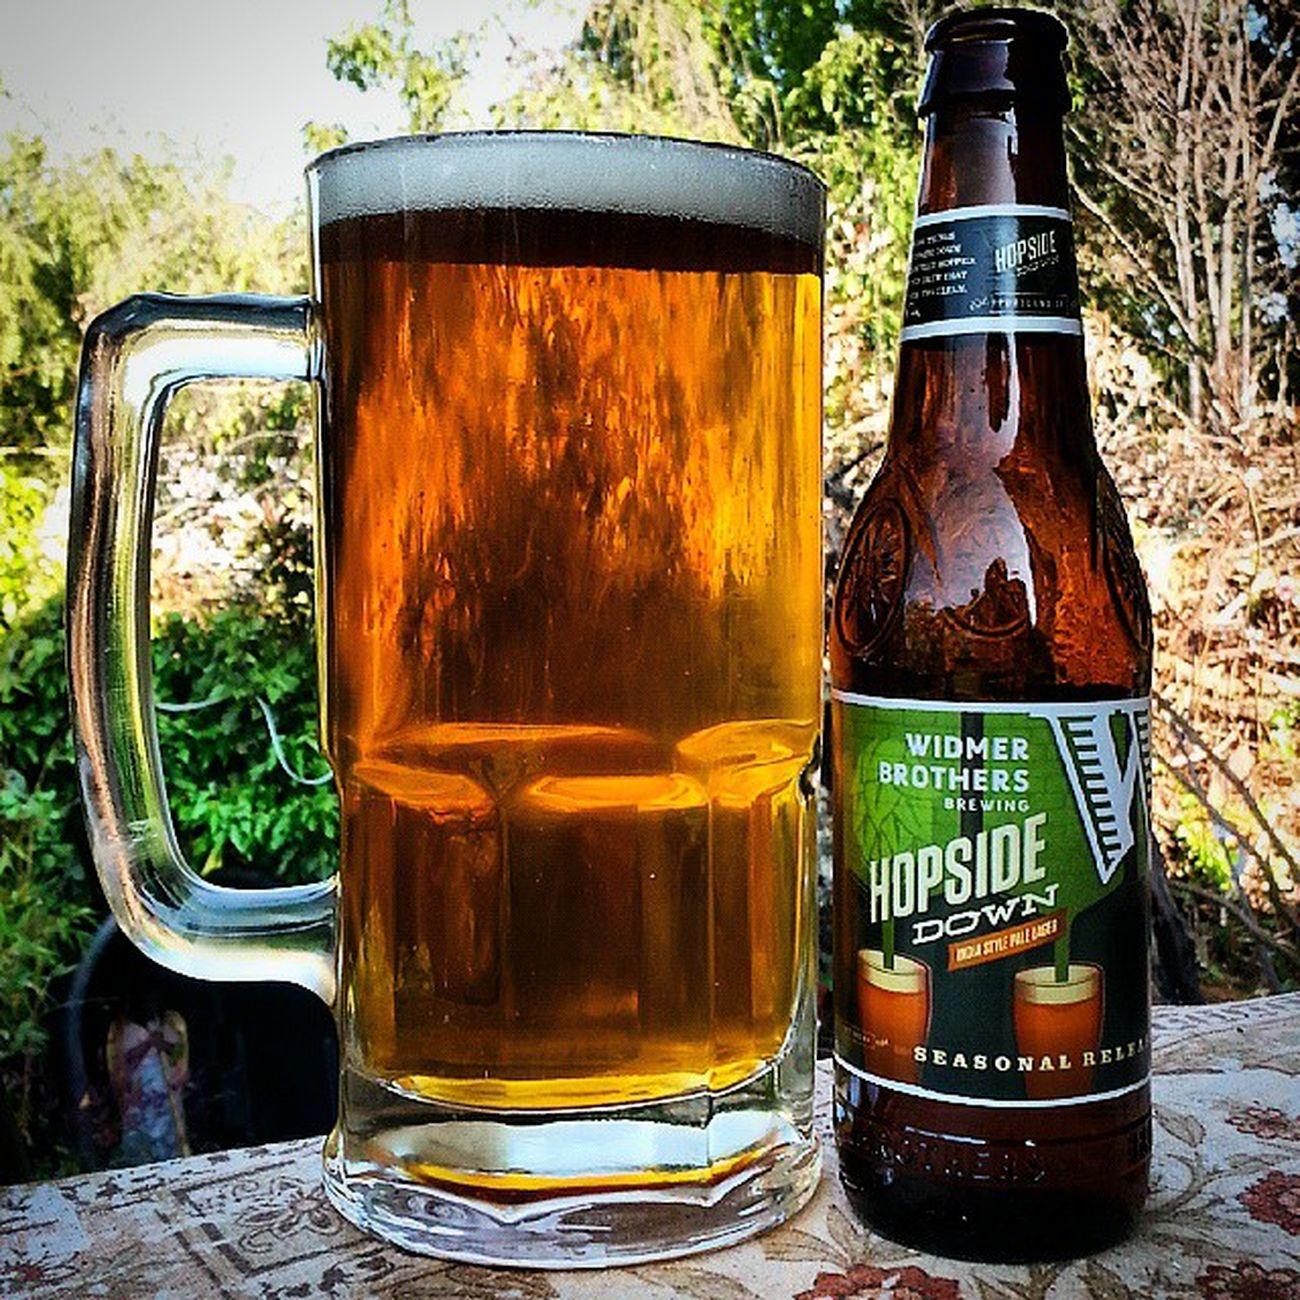 Frostymug Tgif Beerlife Beerislife southernoregon hopsidedown widmerbrothers widmerbrothersbrewing damnfinebeer literstein